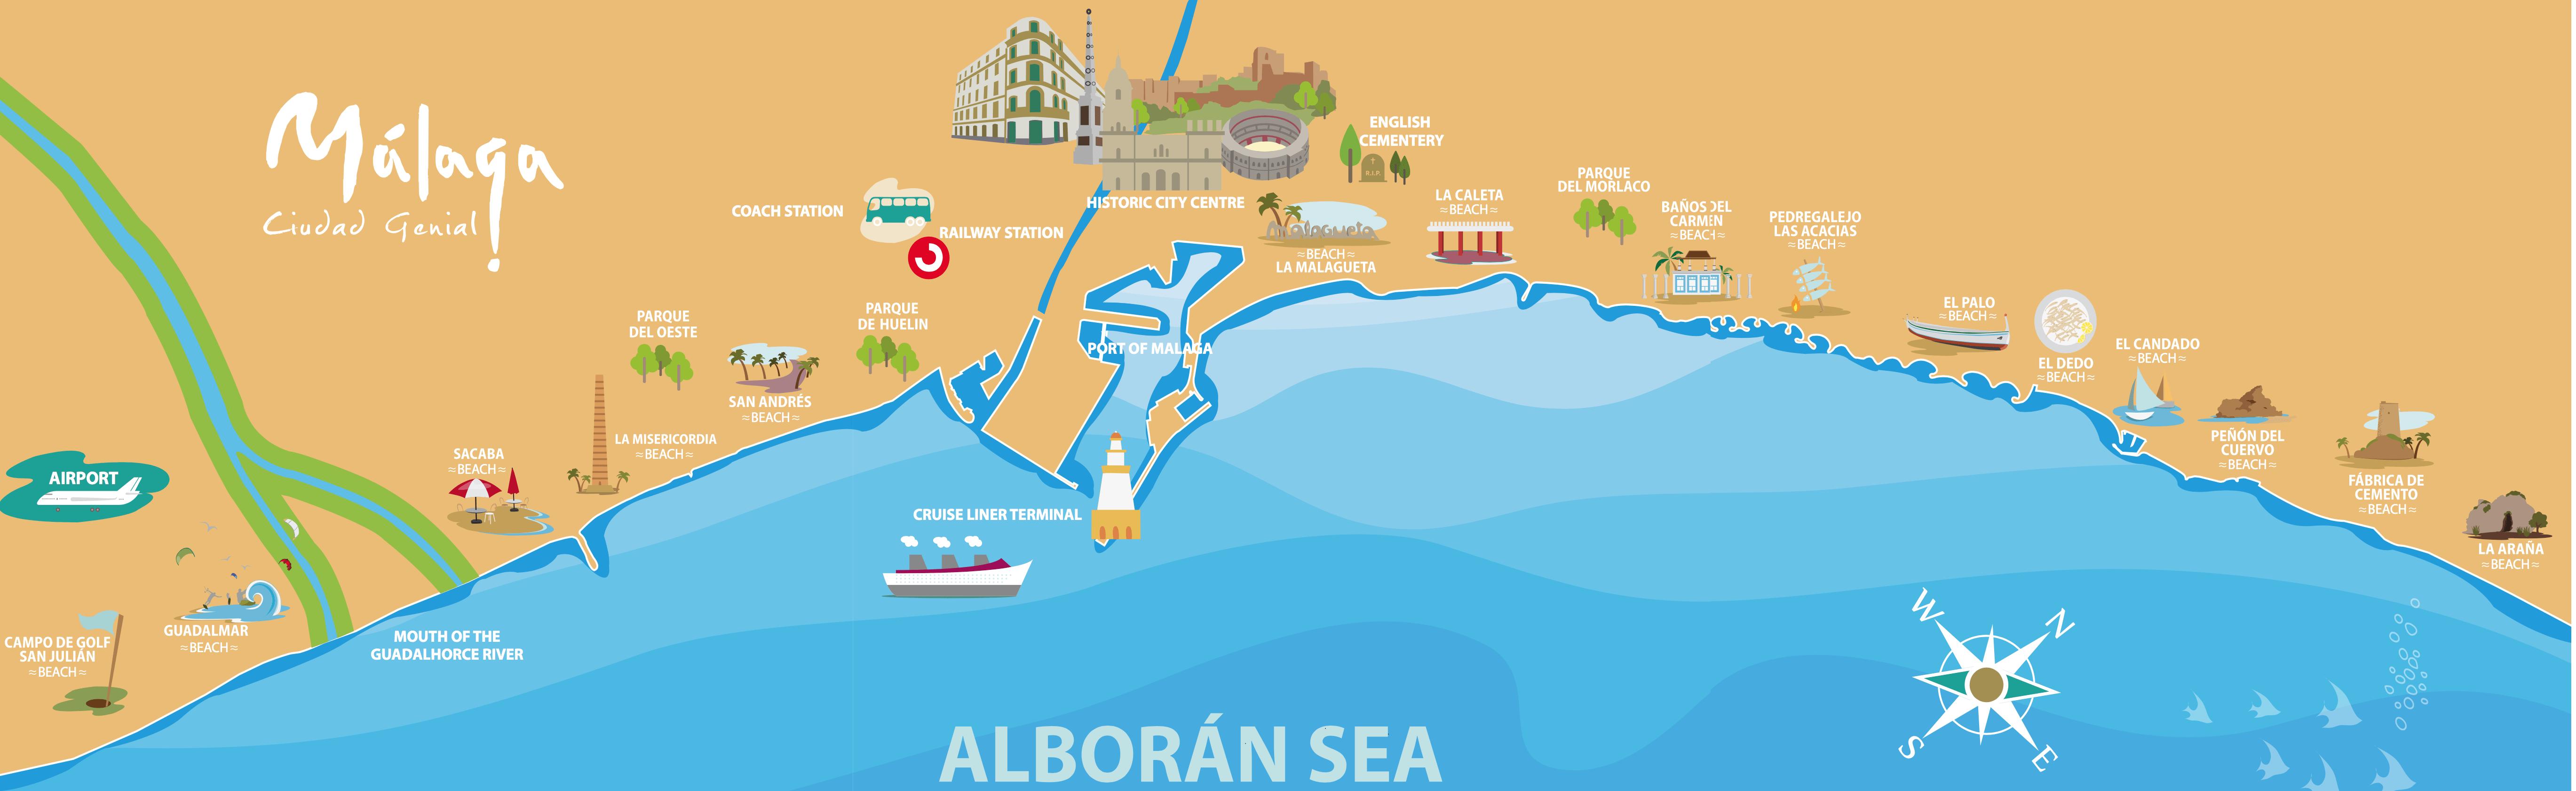 Пляжи Малаги на карте Испании